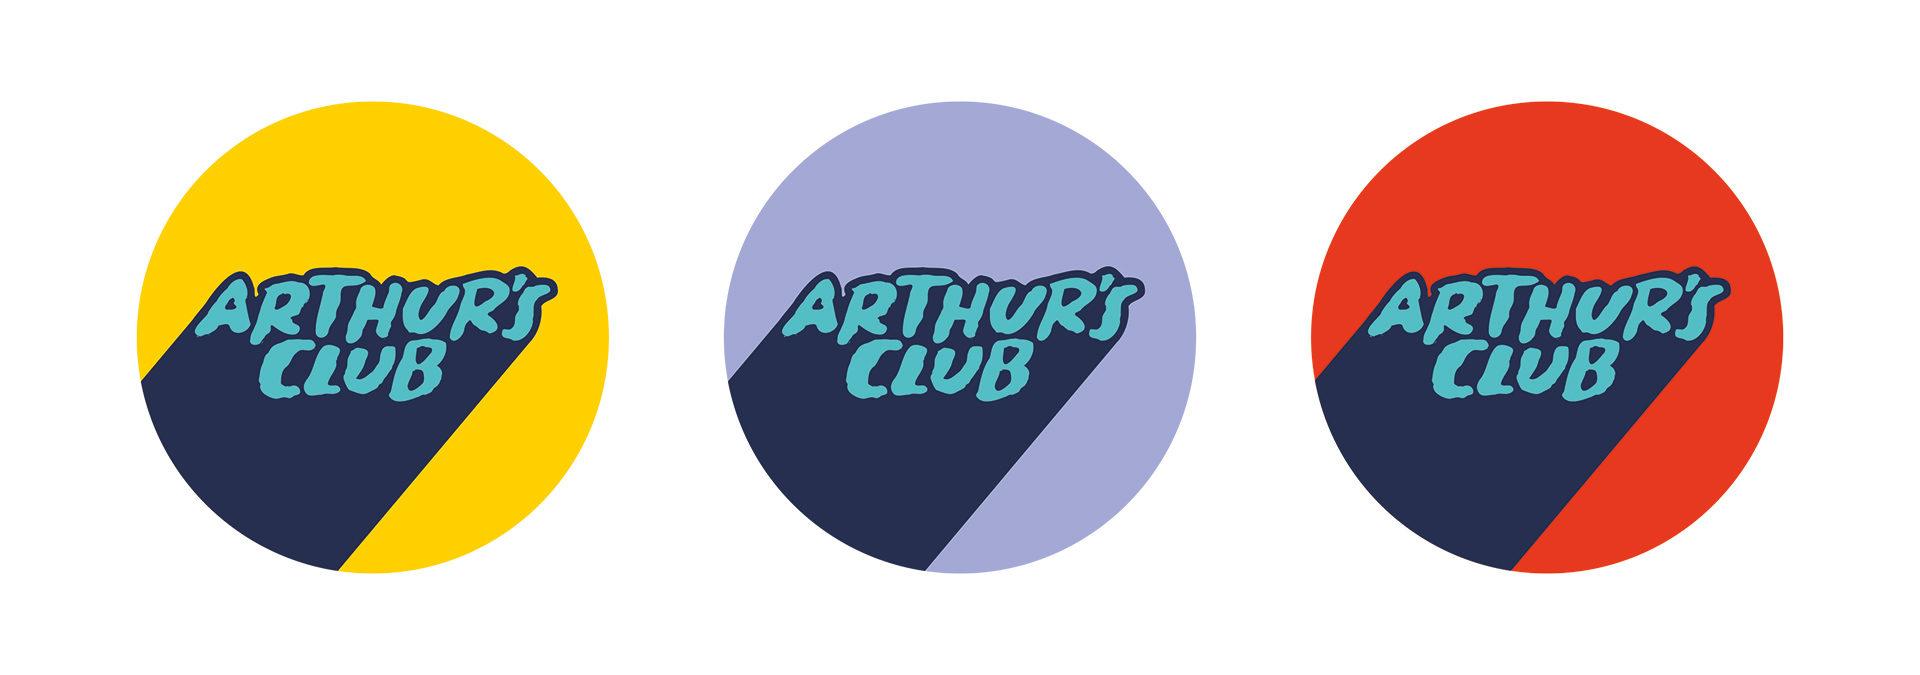 Arthur's Club branding